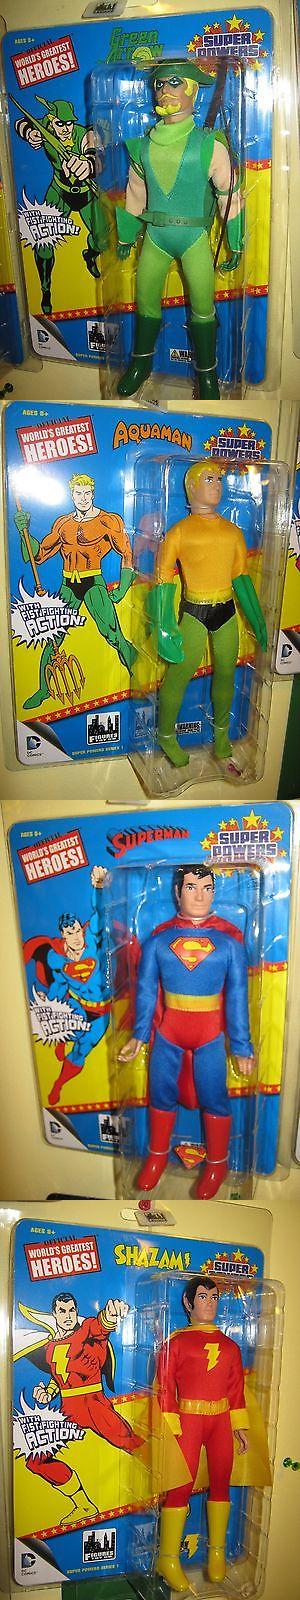 Dracula 19194: Retro Mego Wgsh 8 Dc Comics Action Figure Lot Aquaman Shazam Green Arrow Superm -> BUY IT NOW ONLY: $99.99 on eBay!